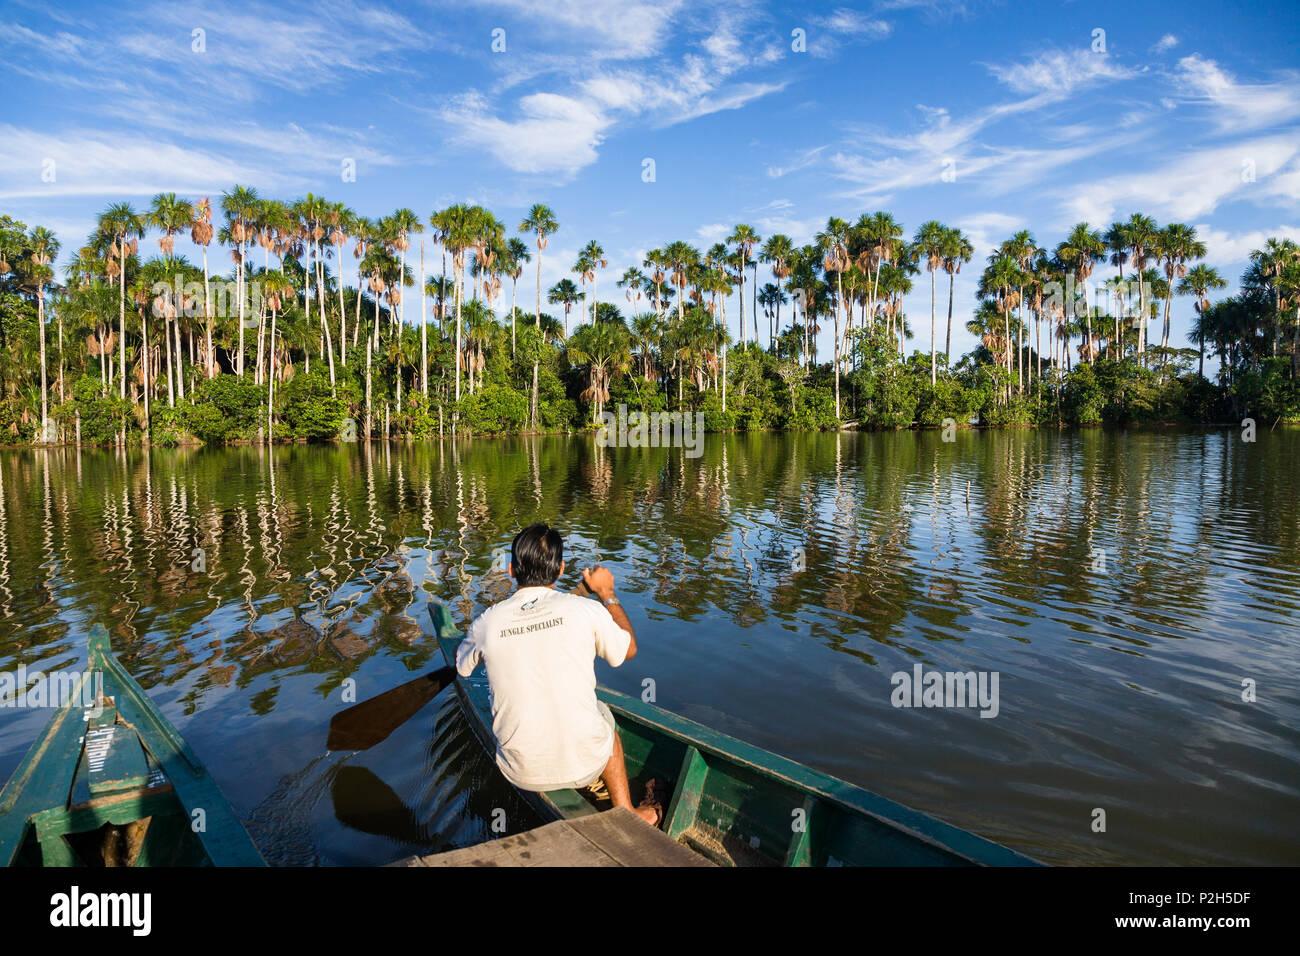 Boot und Mauriti Palmen, Buriti, moriche Palmen, an Sandoval Lake, Mauritia flexuosa, Tambopata National Reserve, Peru, Südafrika Stockbild